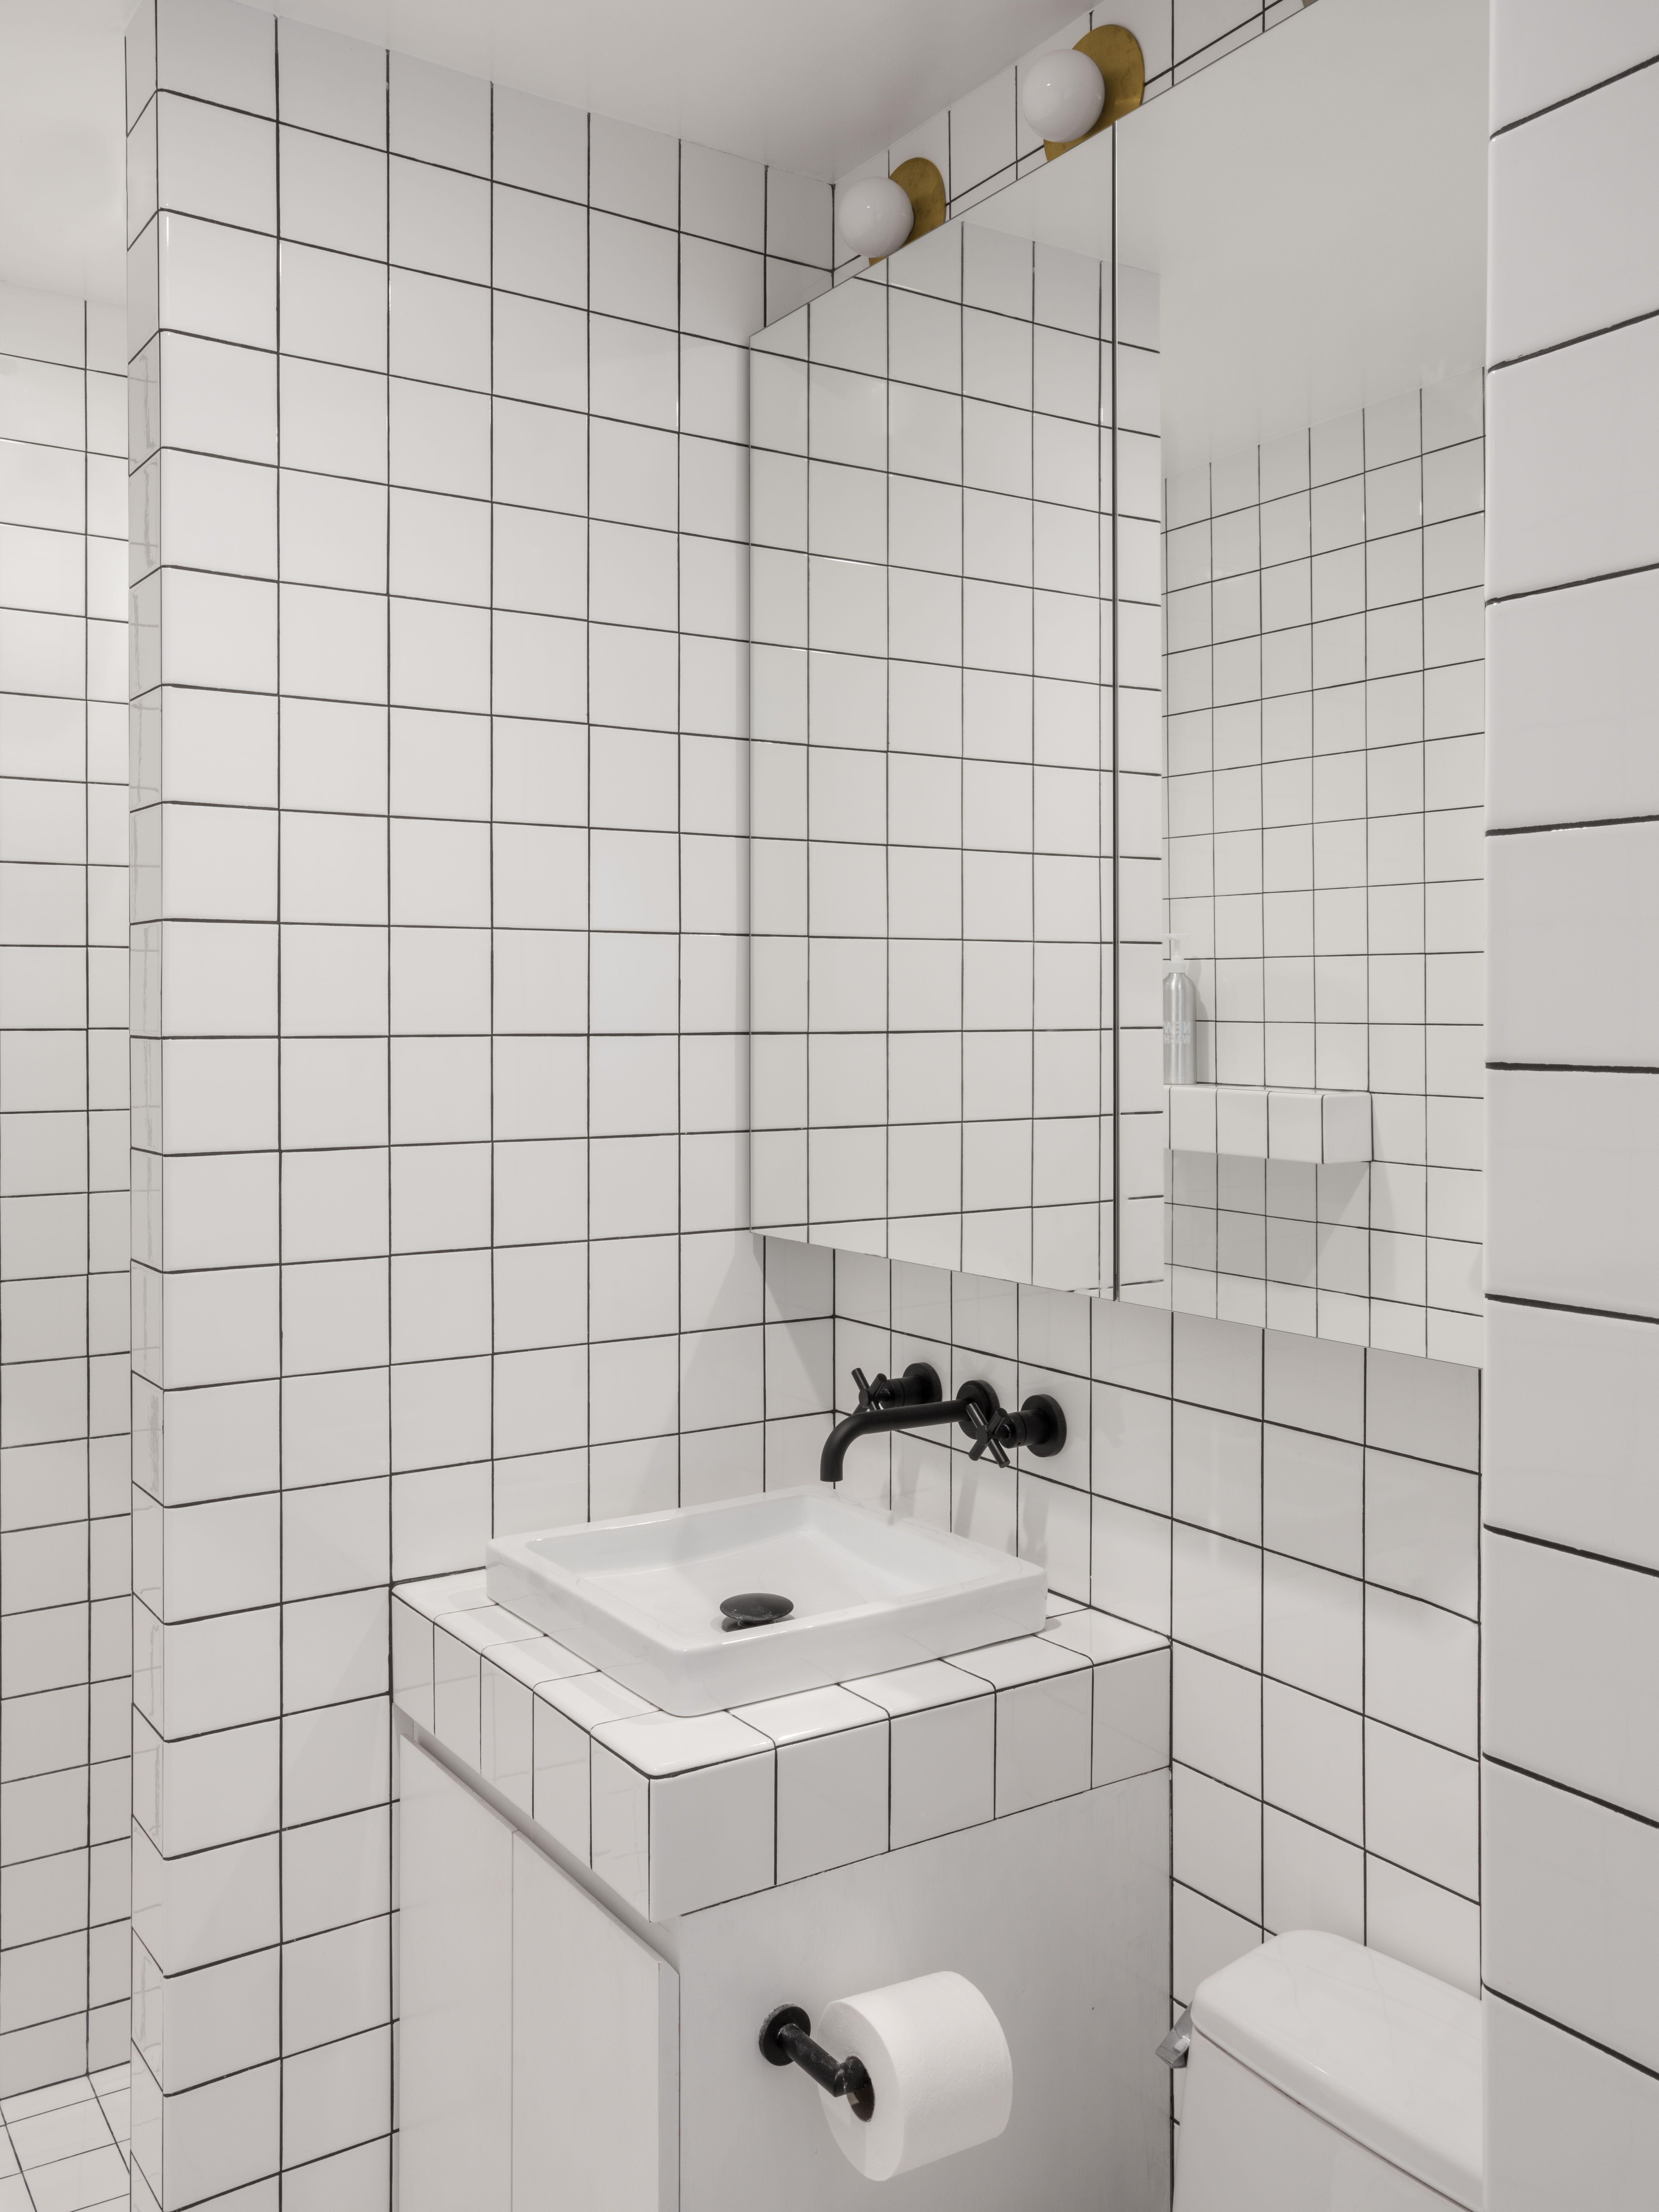 Two Graphic Bathroom Tile Ideas Courtesy Of Tali Roth Bathroom Red White Bathroom Tiles Graphic Tile Bathroom